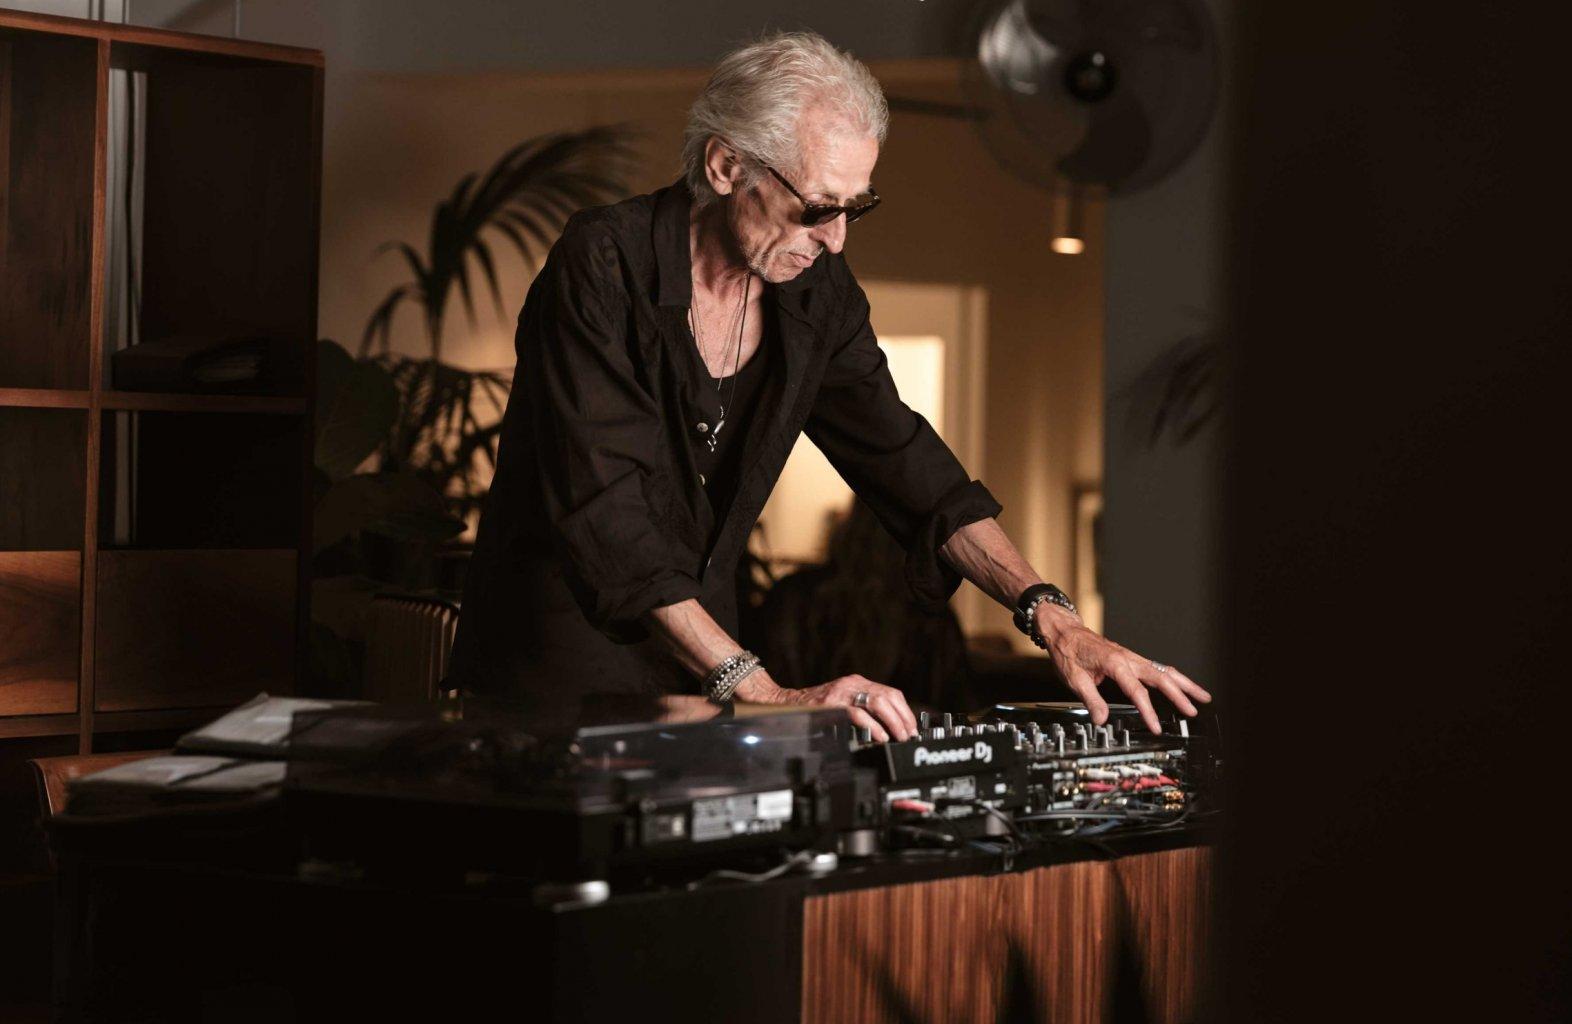 Hans Havenaar 'The Dutch Touch' returns on the decks